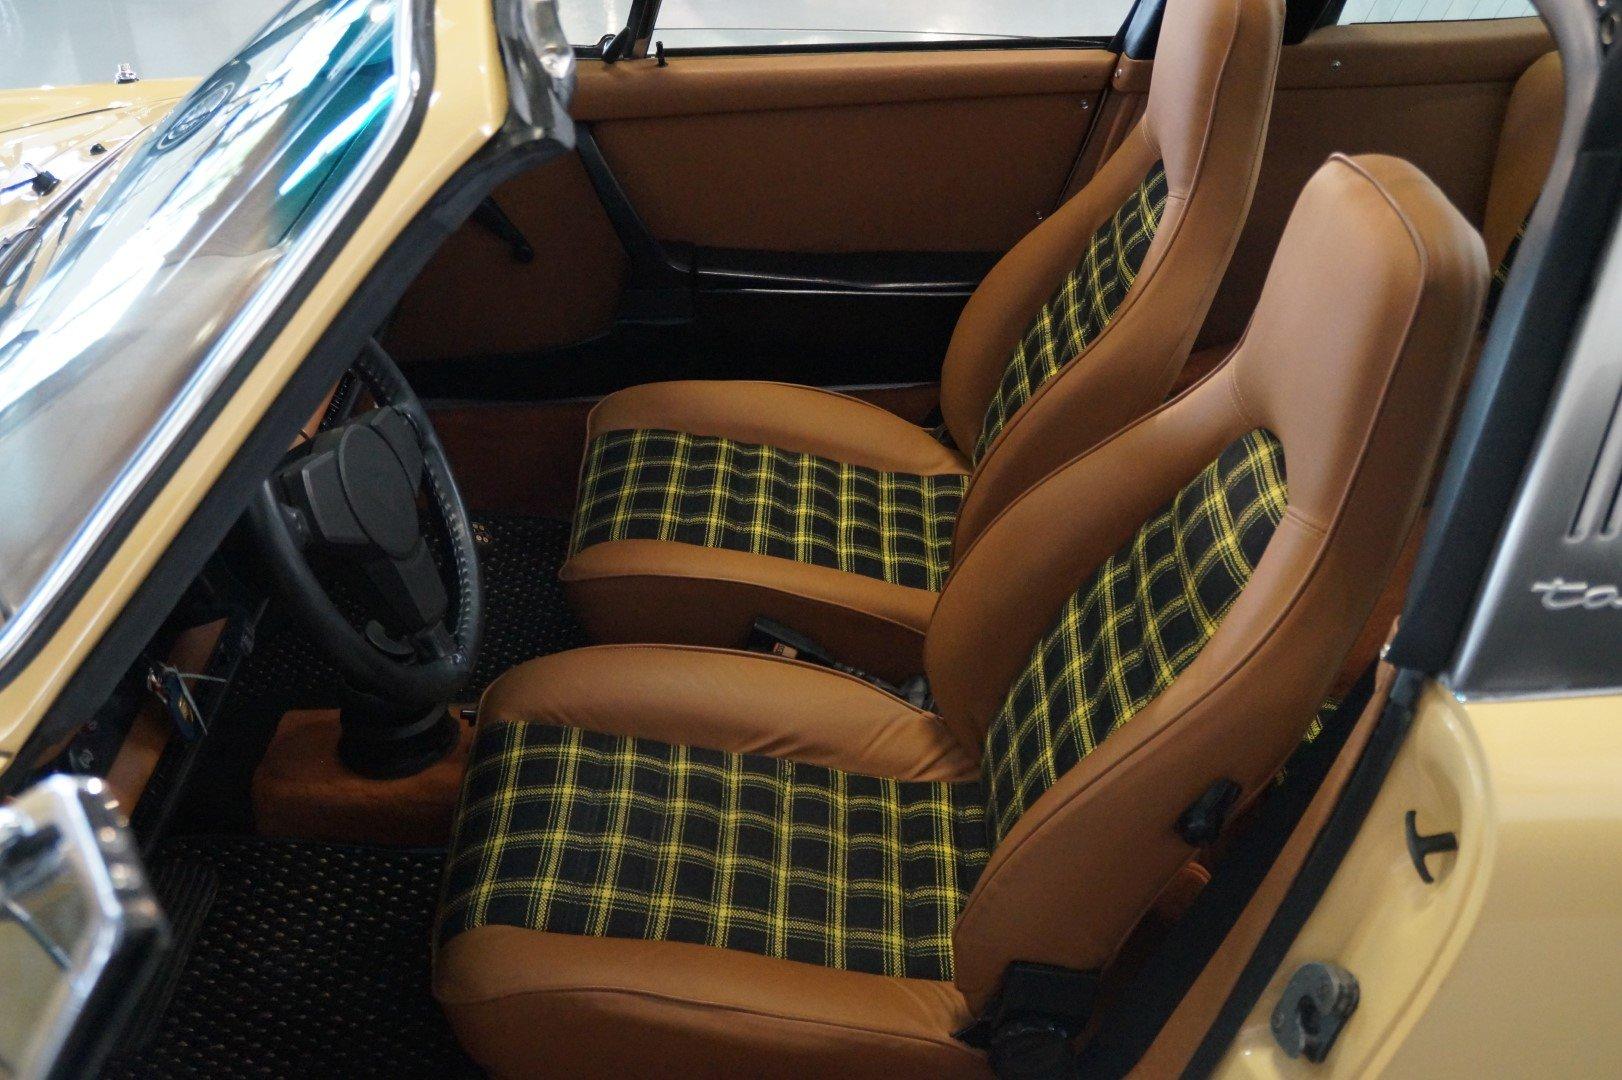 PORSCHE 911 911S 2.7 Targa Rare Colour Combination (1974) For Sale (picture 3 of 6)